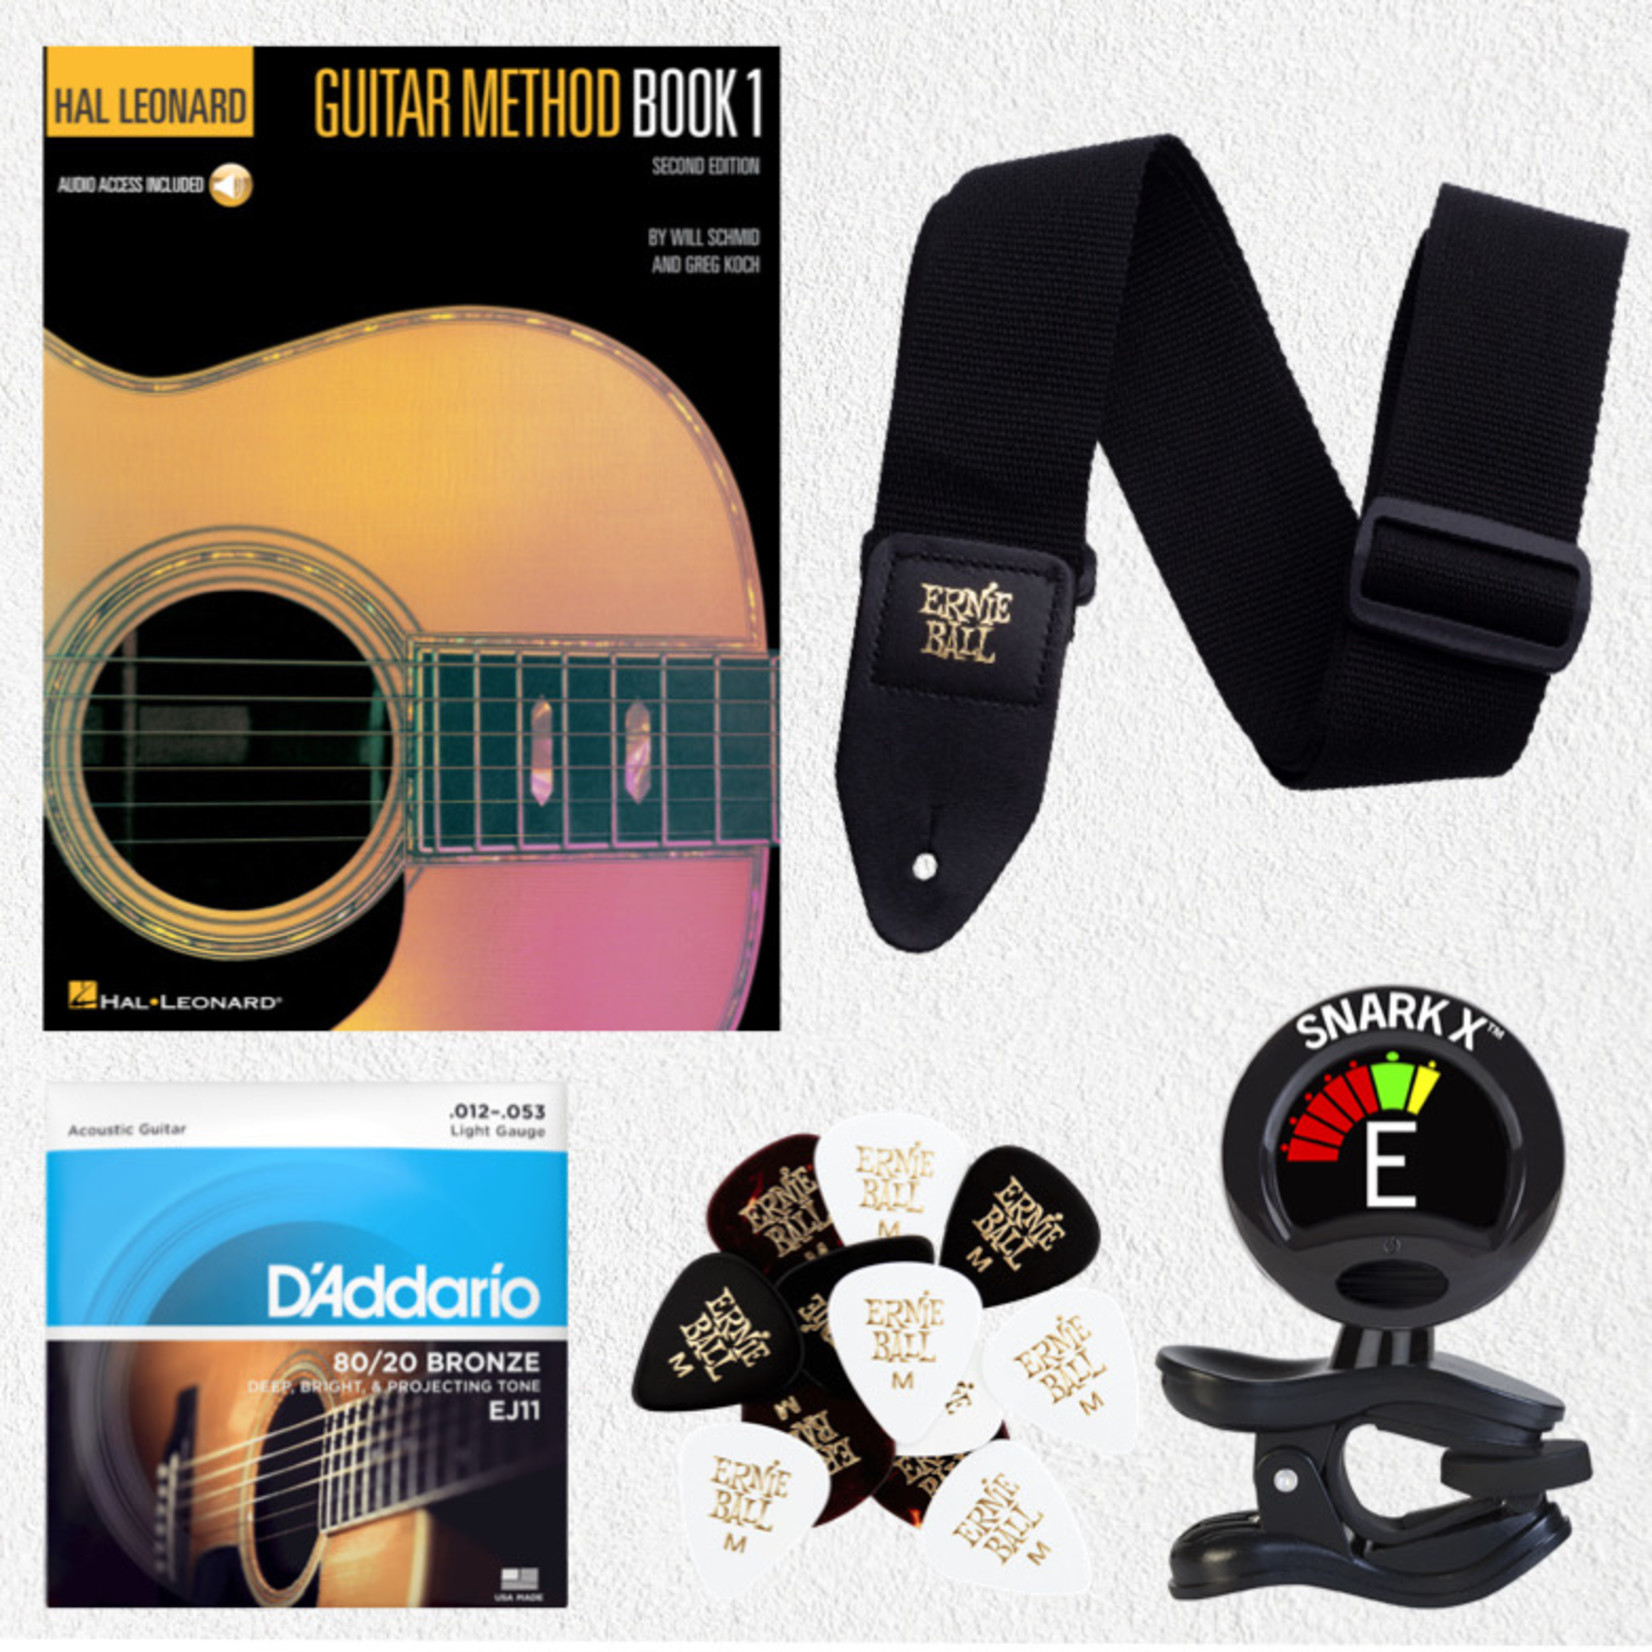 Guitar Class Accessory Kit - Book 1